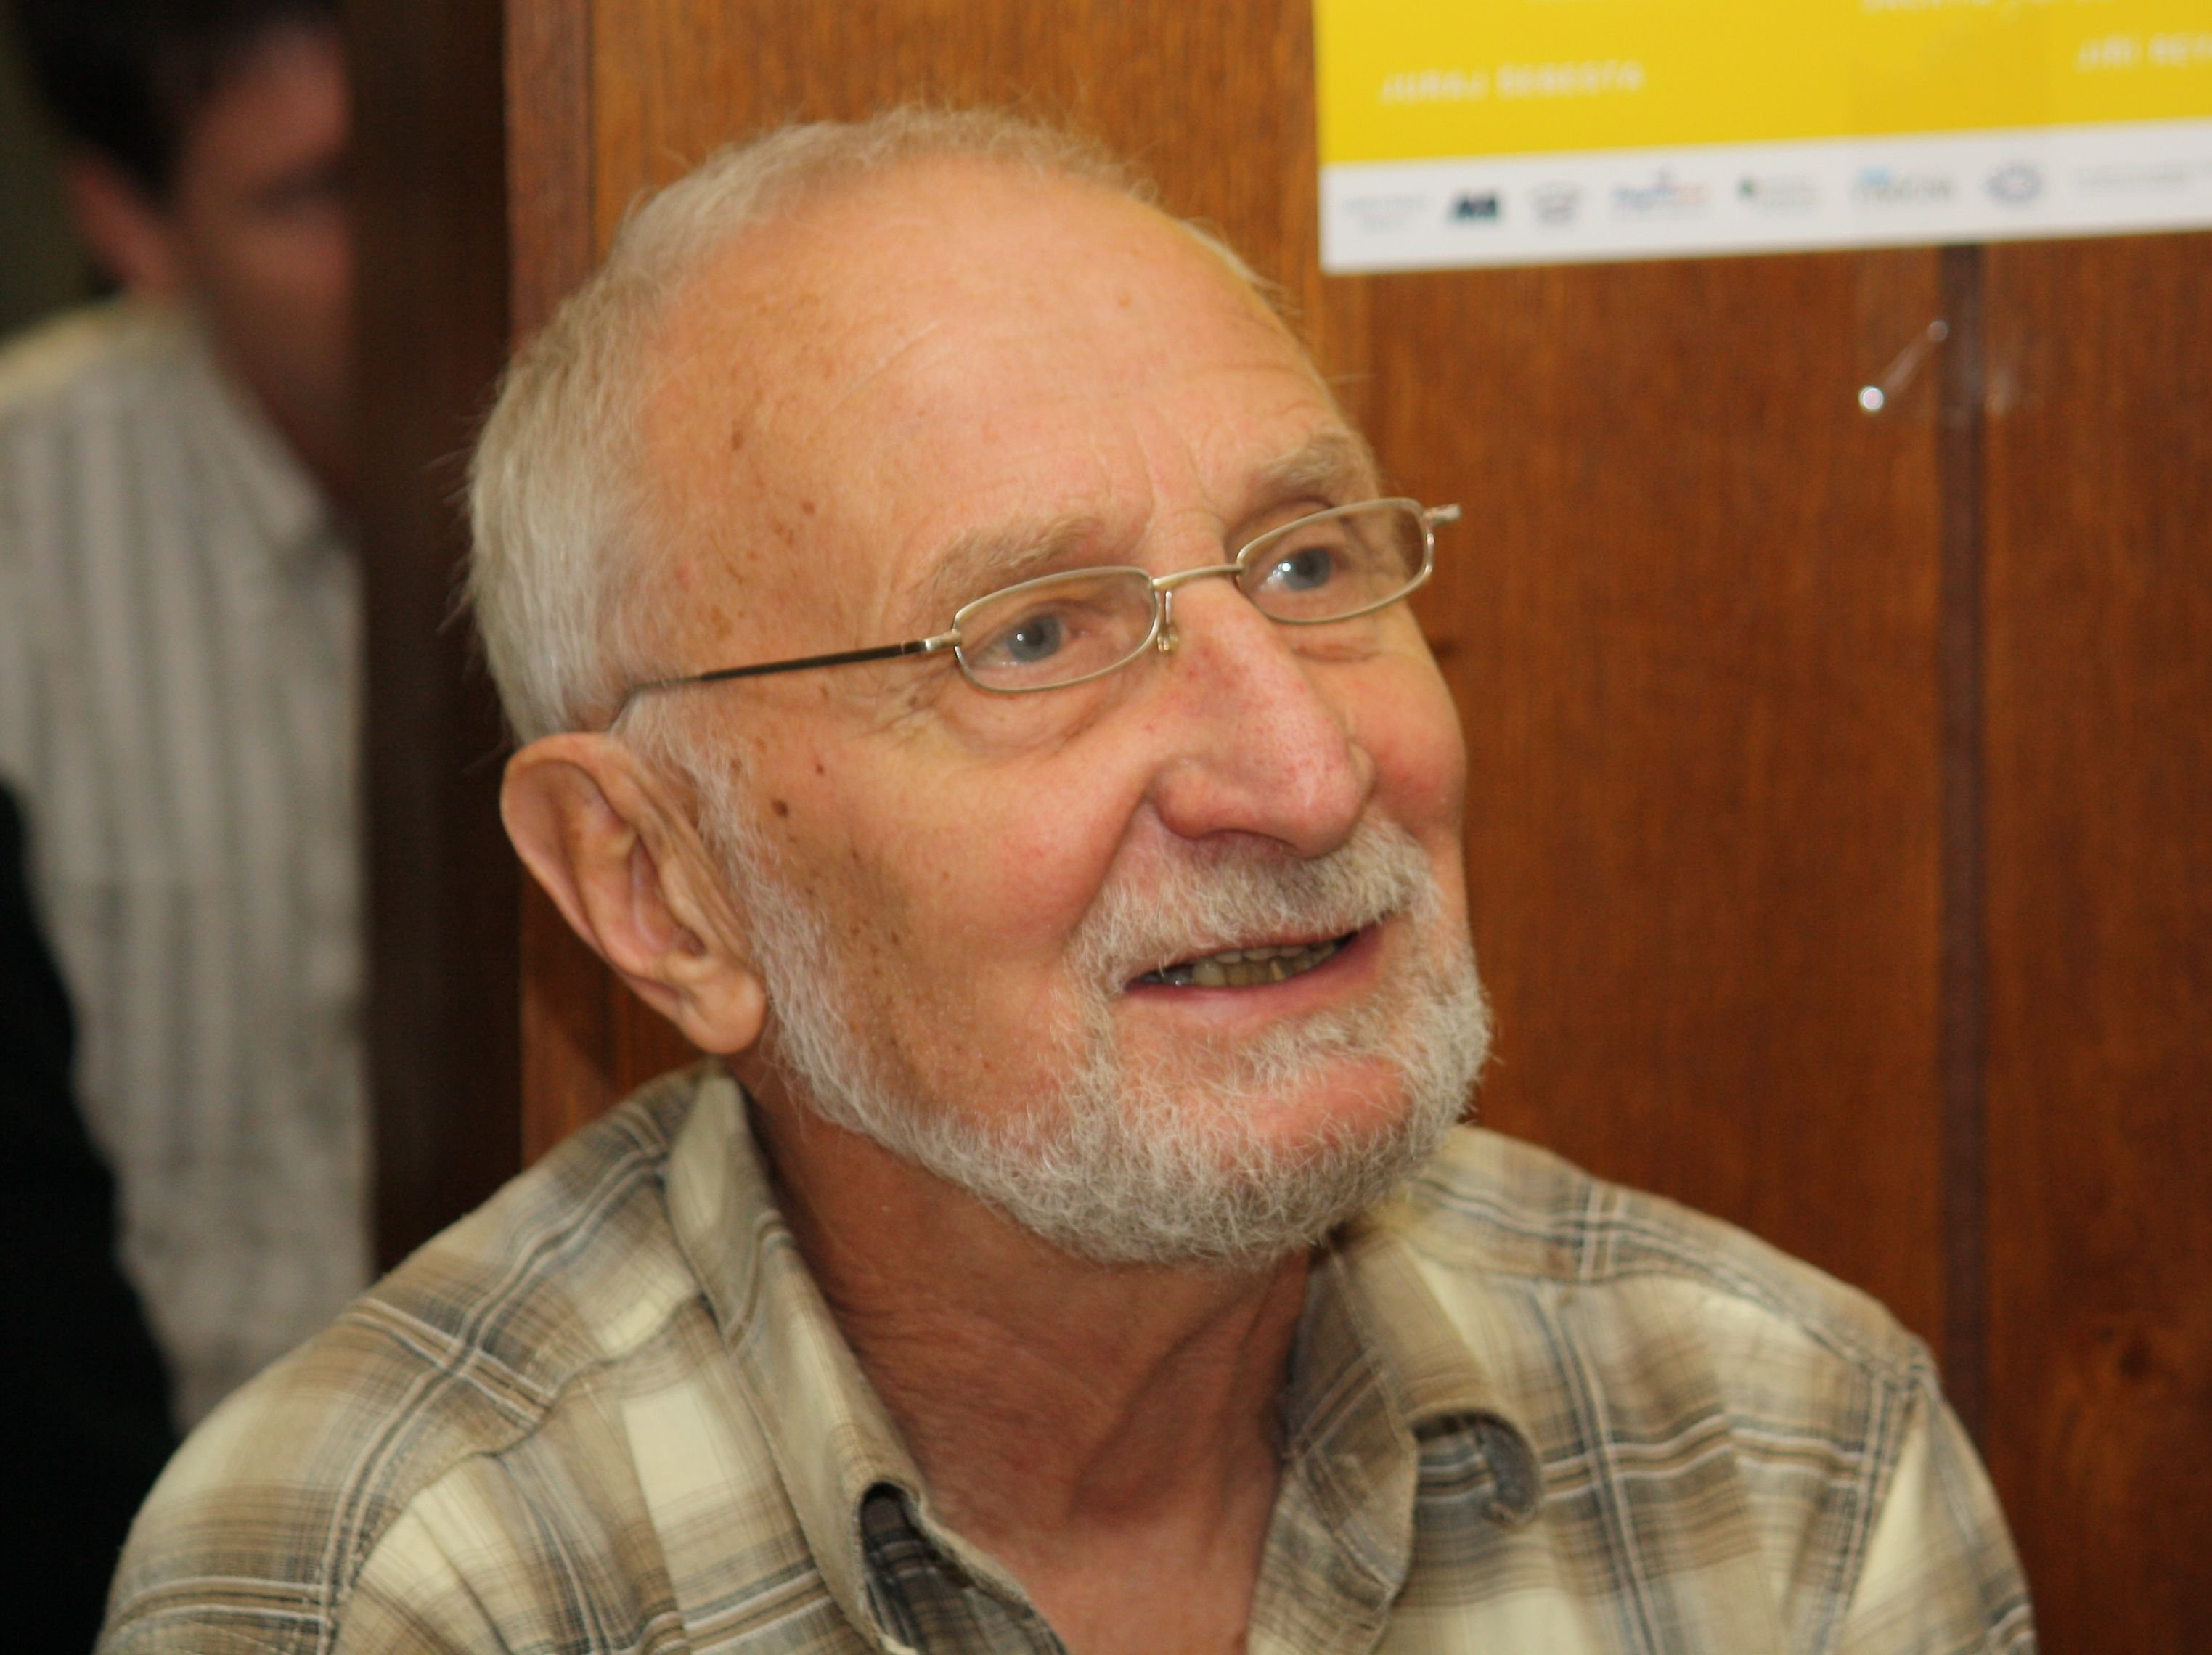 Václav Větvička